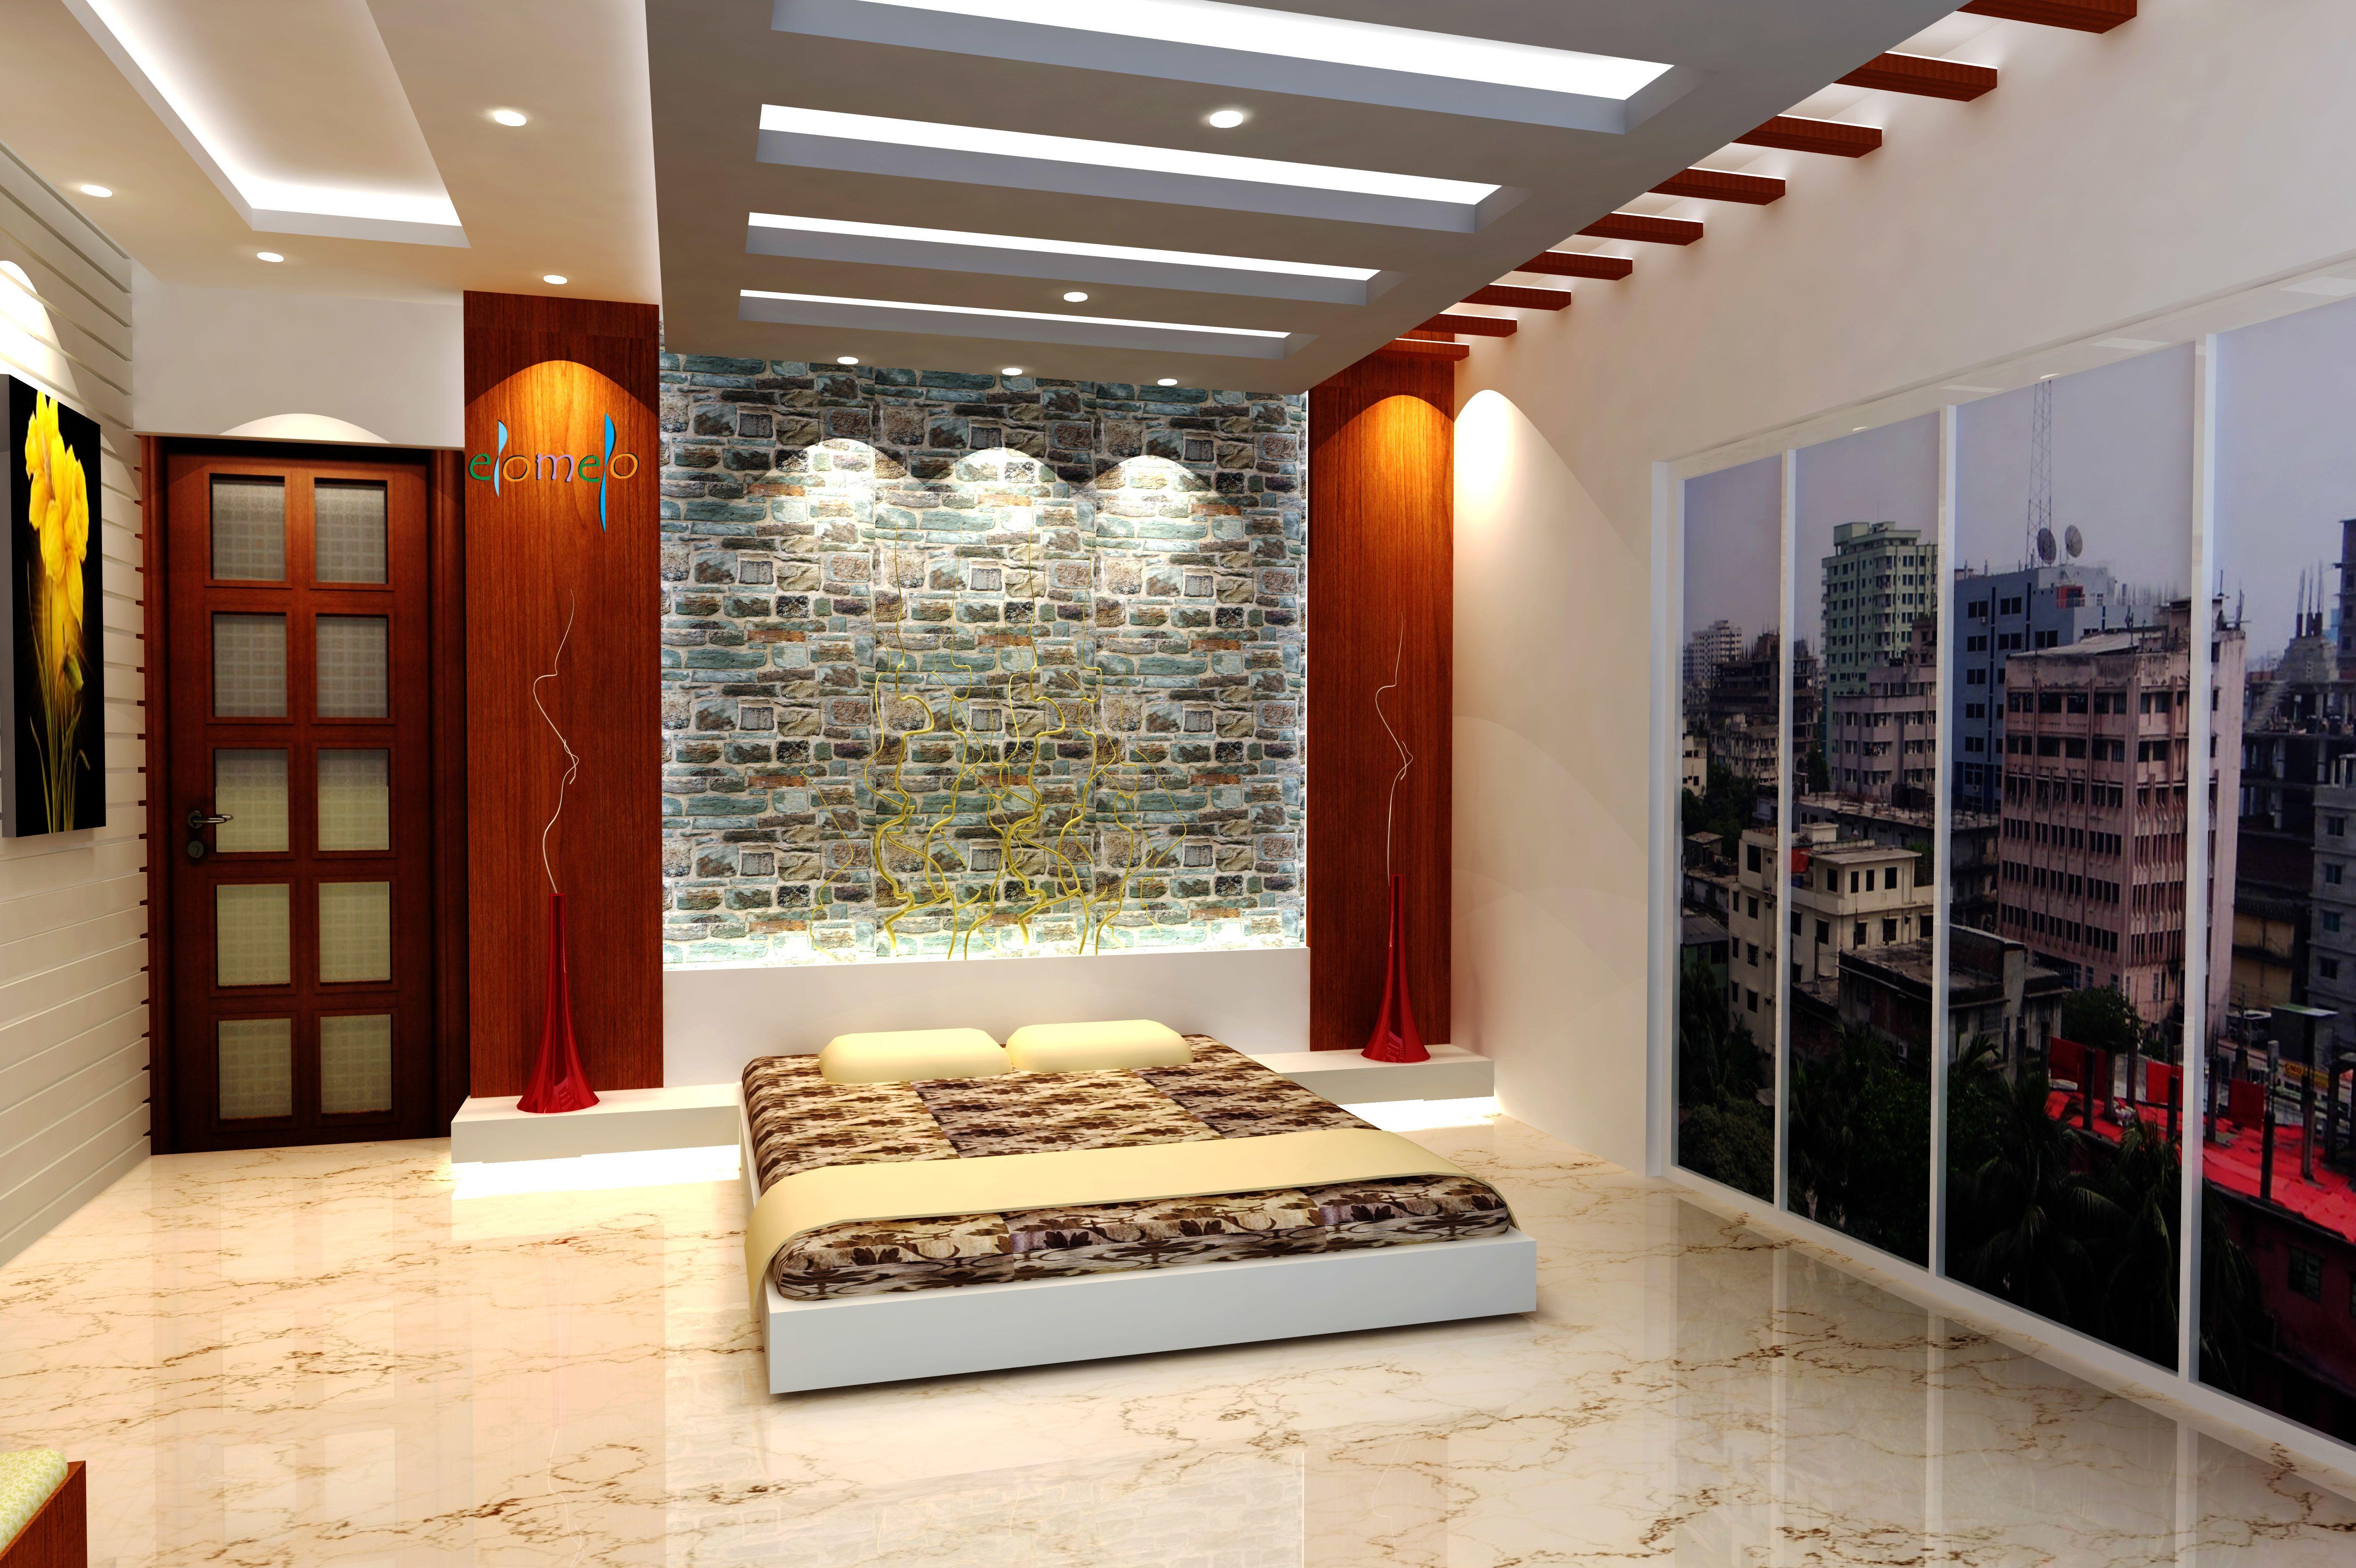 Bed Rooms Room Interior Design Companies Interior